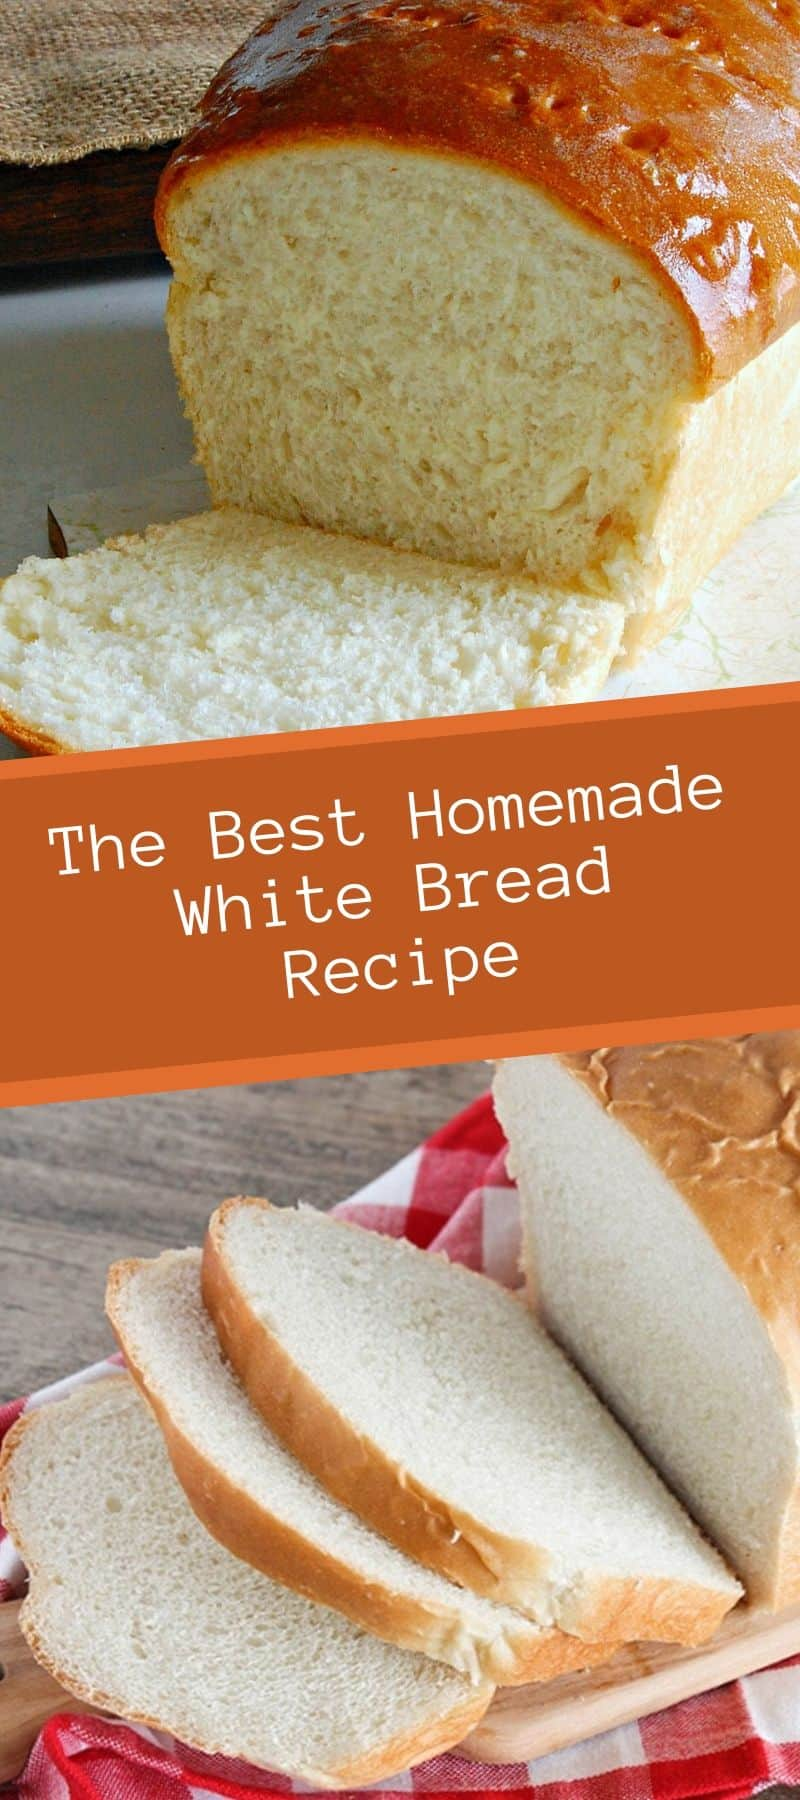 The Best Homemade White Bread Recipe 3